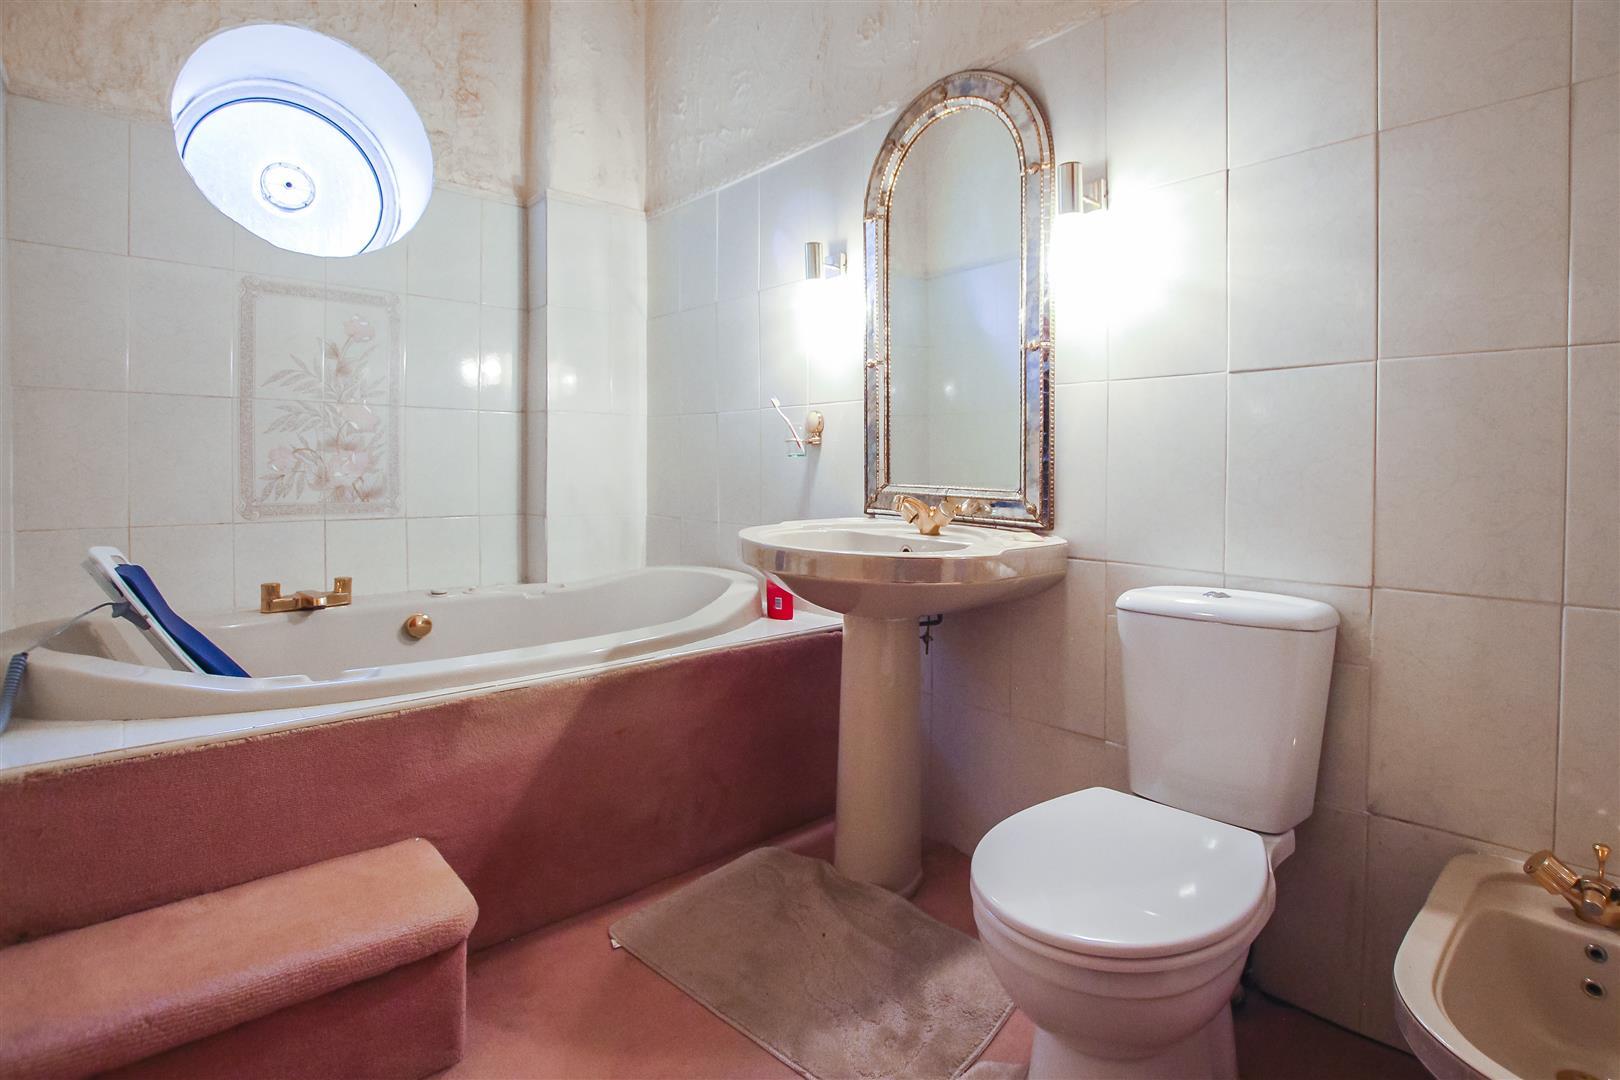 4 Bedroom House For Sale - Bathroom